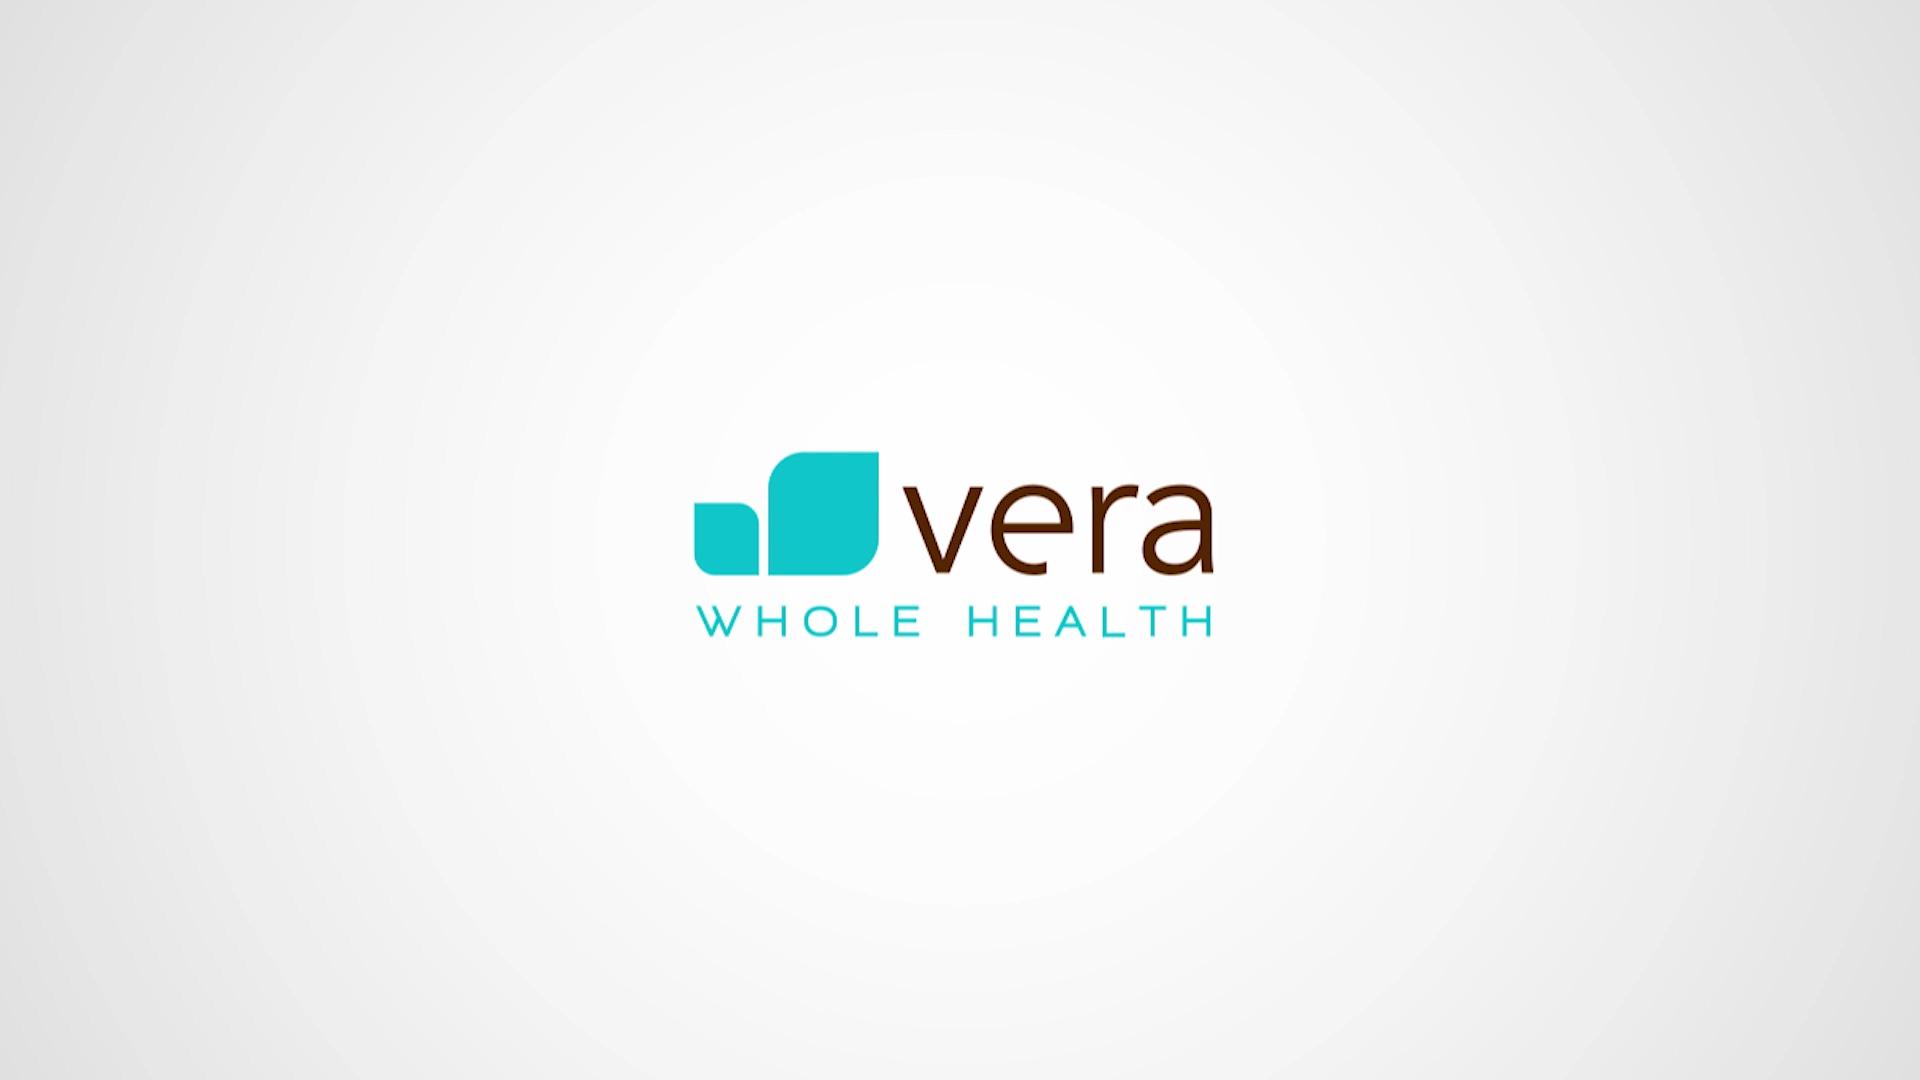 21.06_blog-video-phil-frederick_01_vera